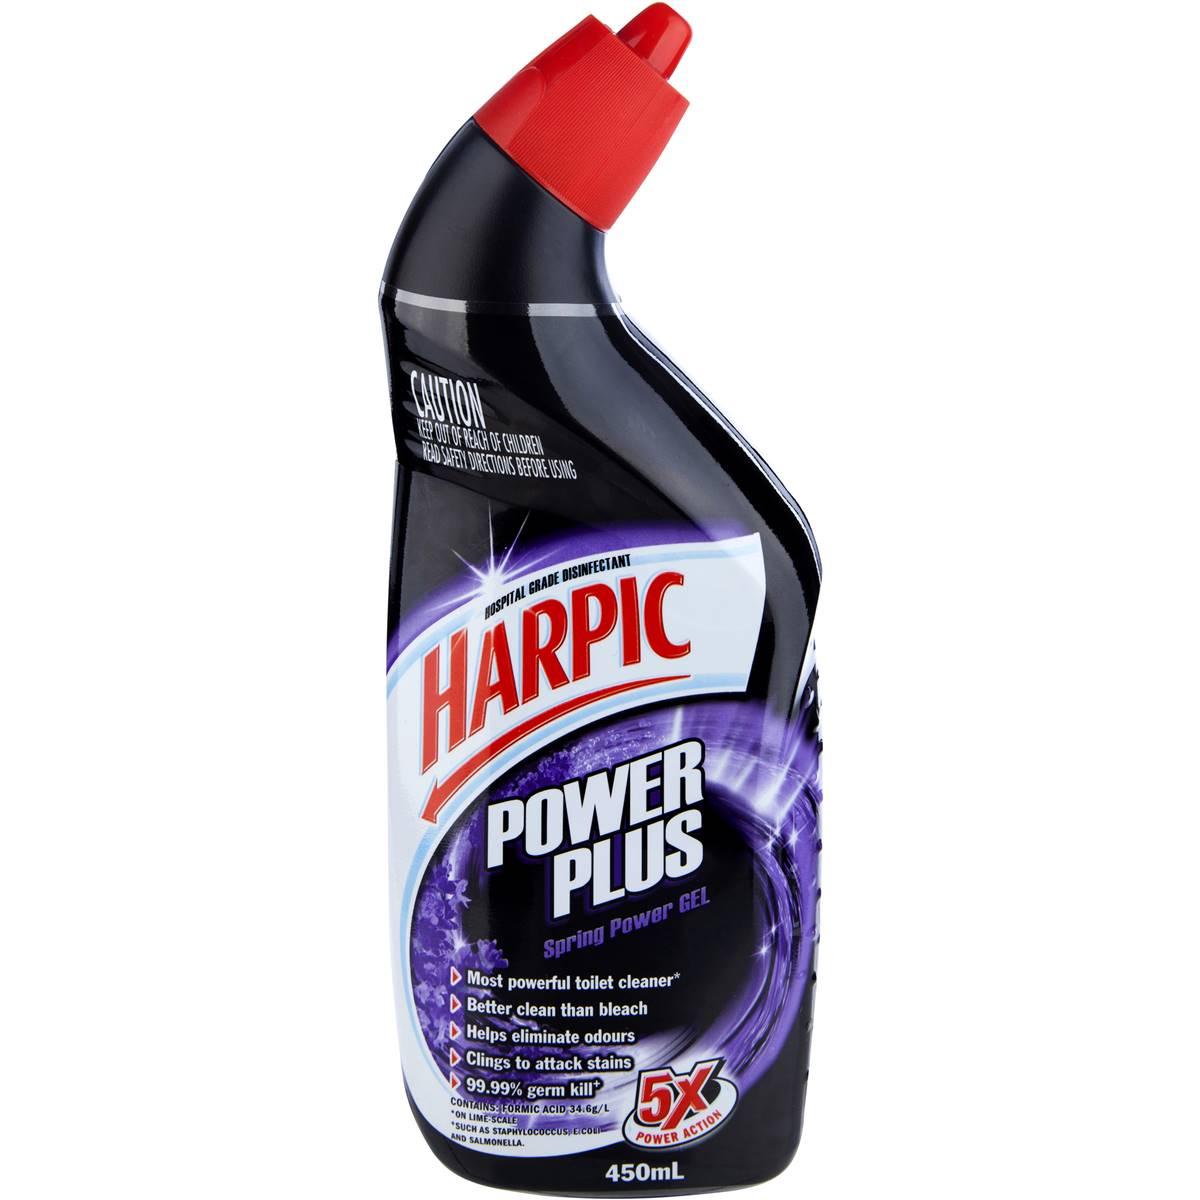 Harpic Power Plus Toilet Cleaner Spring Power Woolworths